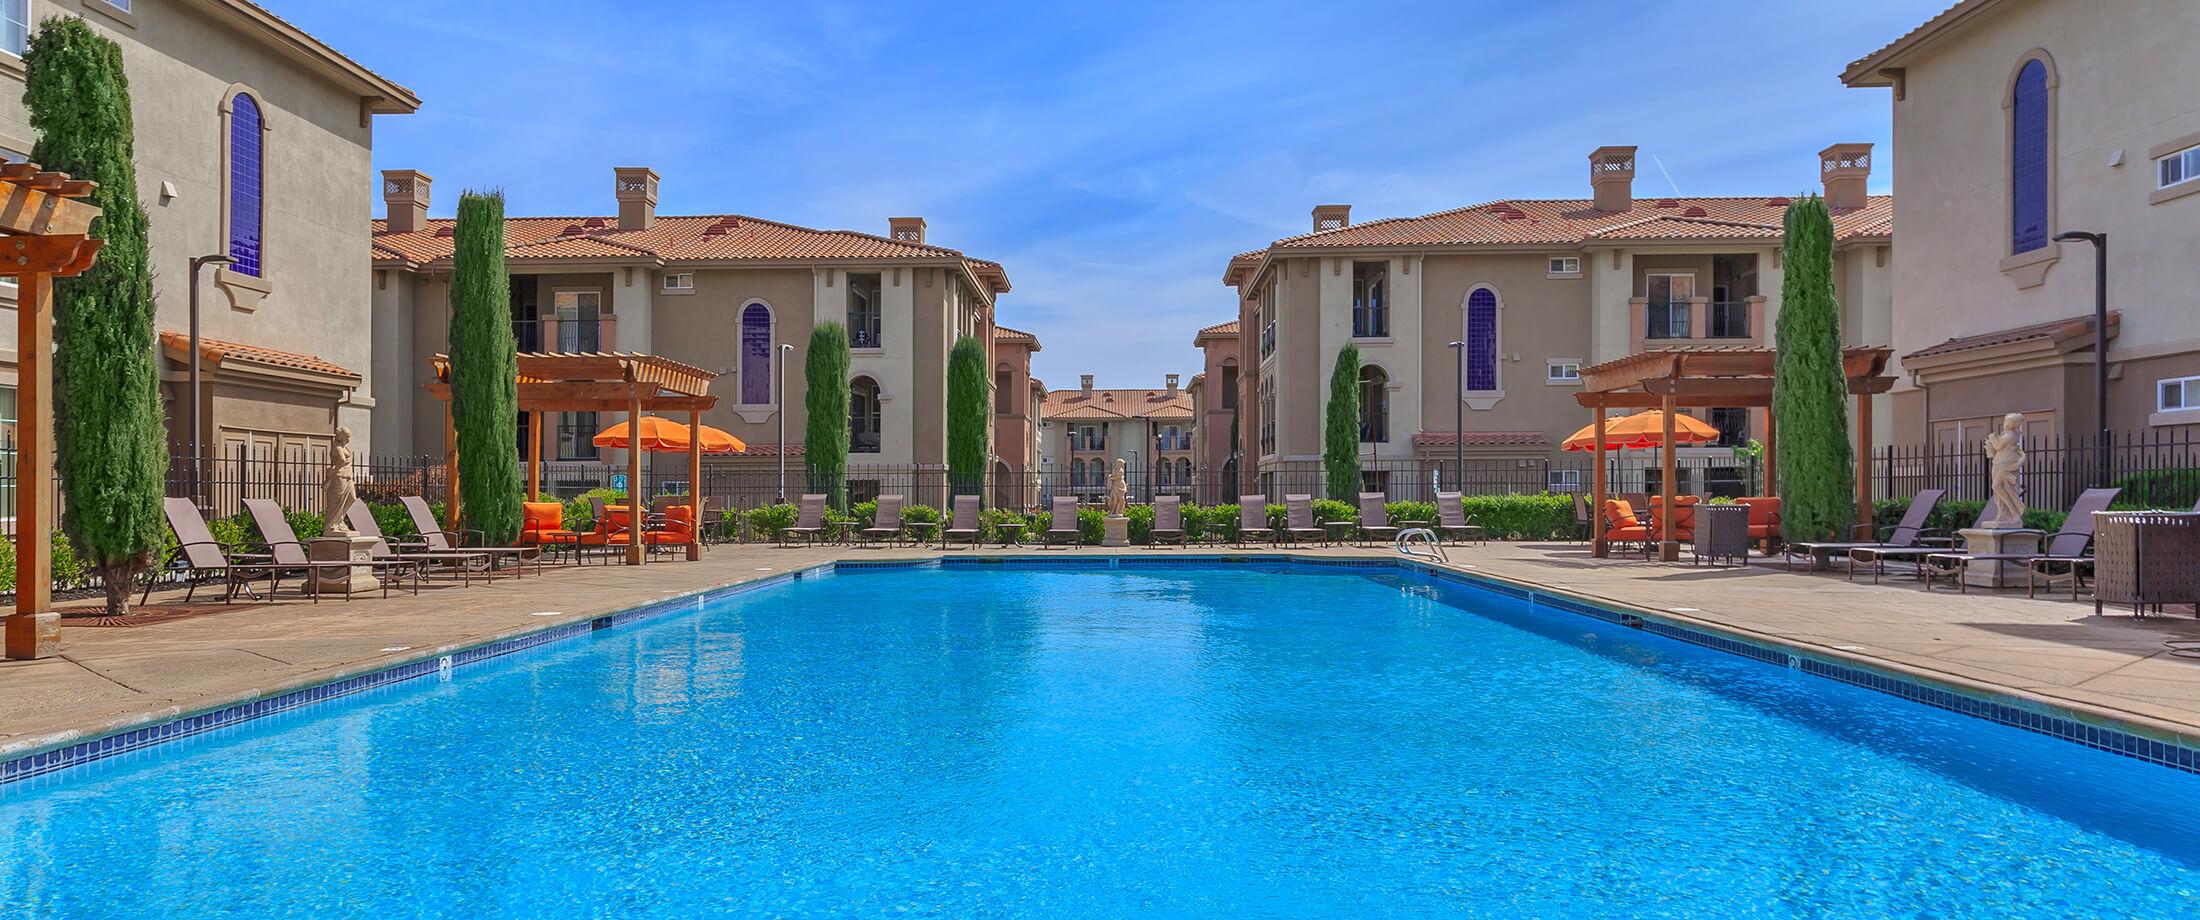 San Marco Villas Apartments In Pittsburg Ca